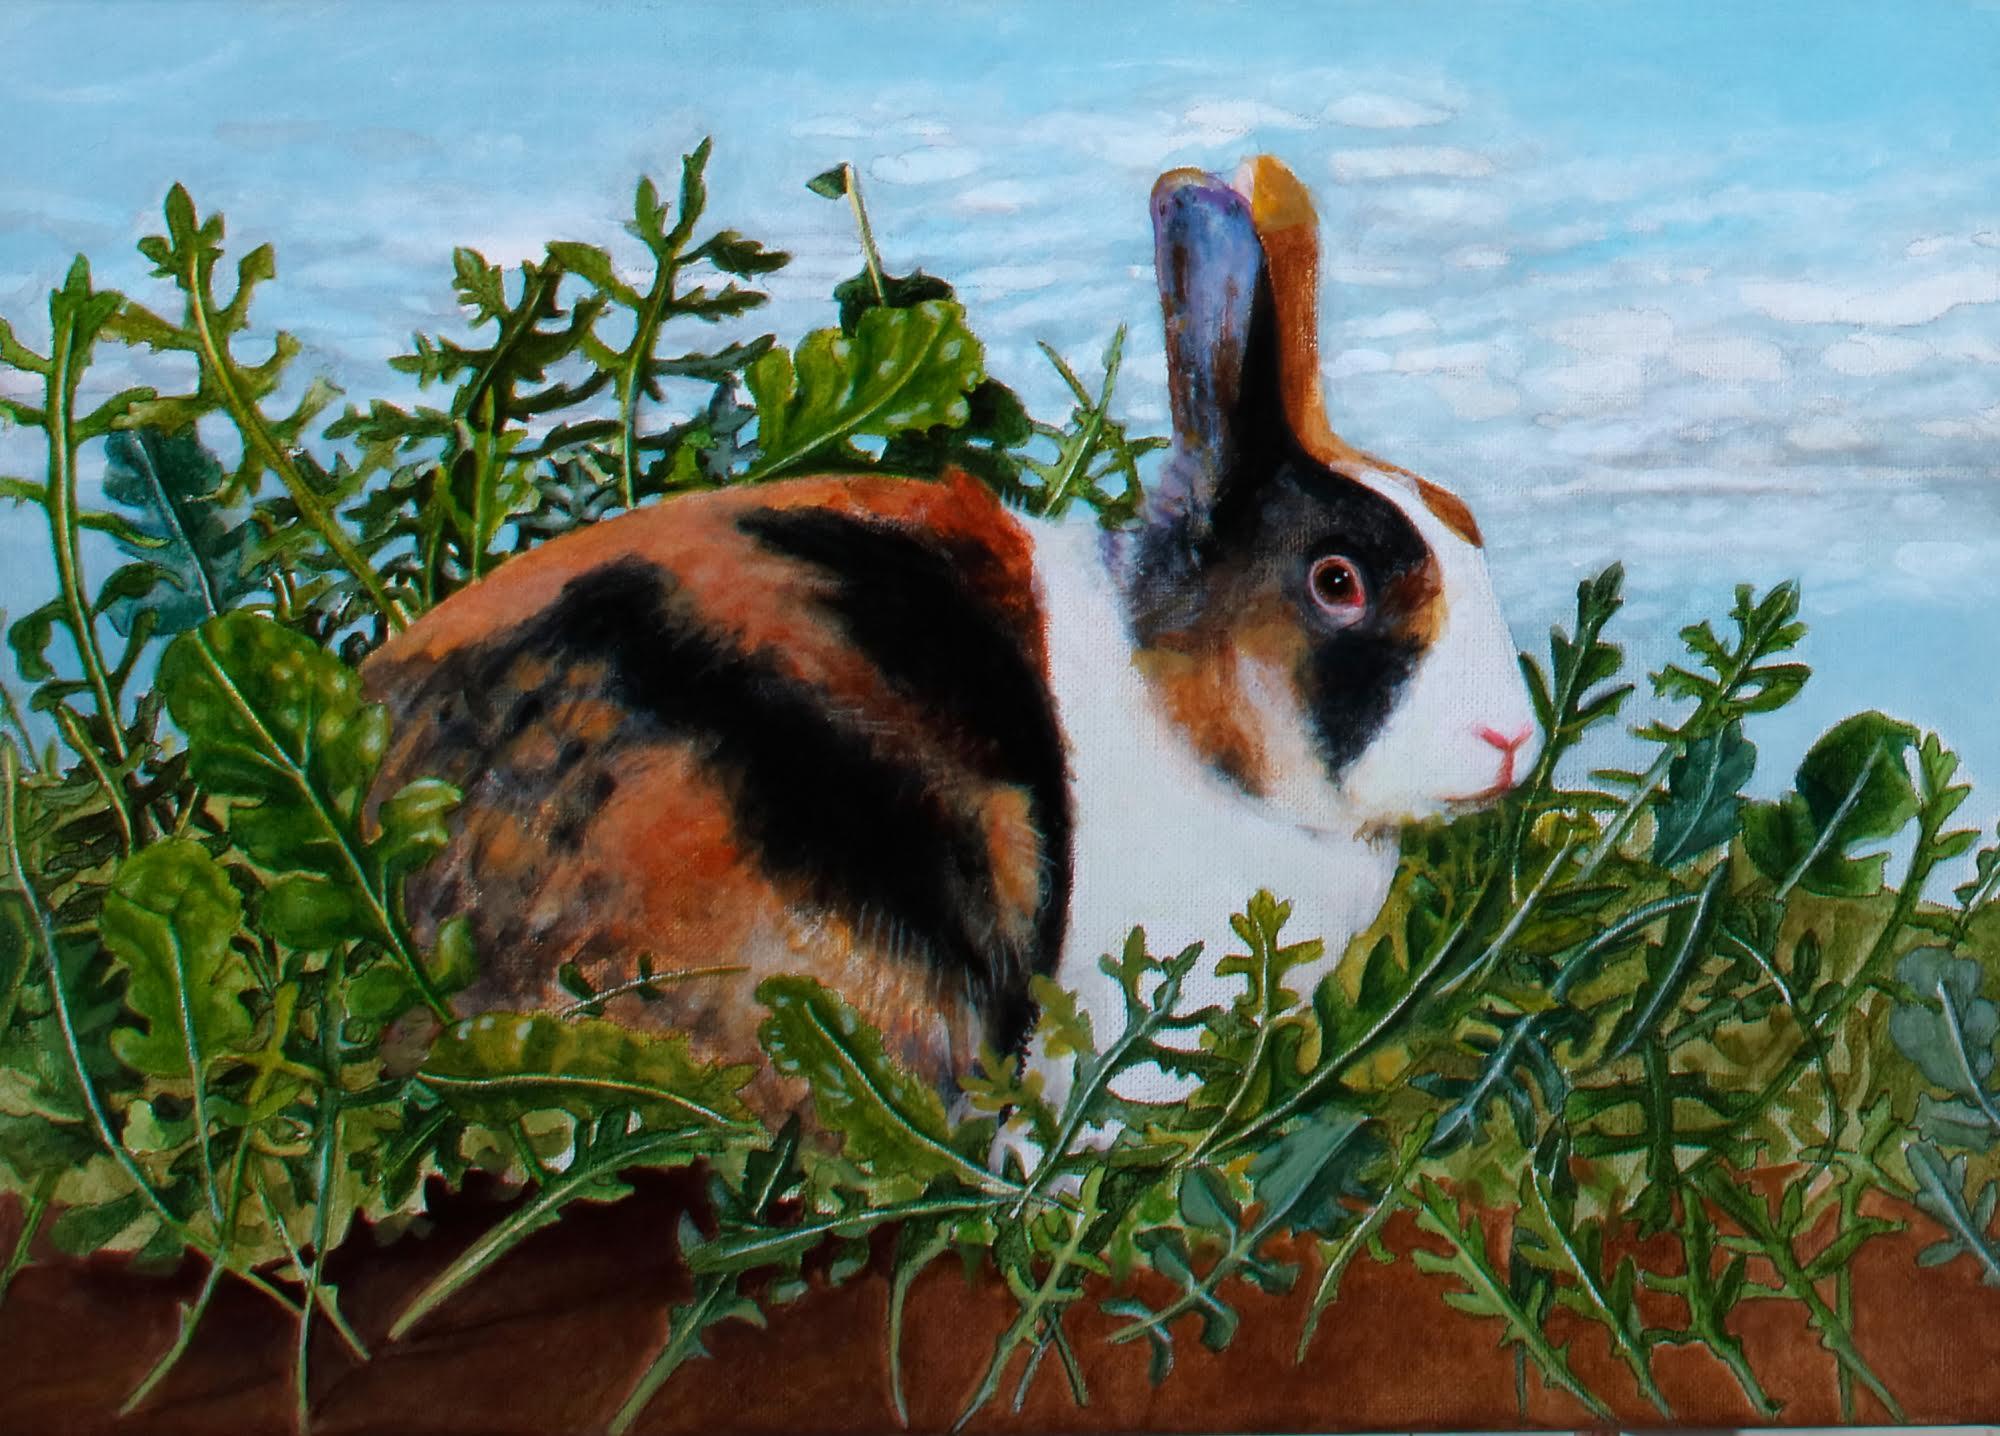 Rabbit with Rocket by Artist EBWatts